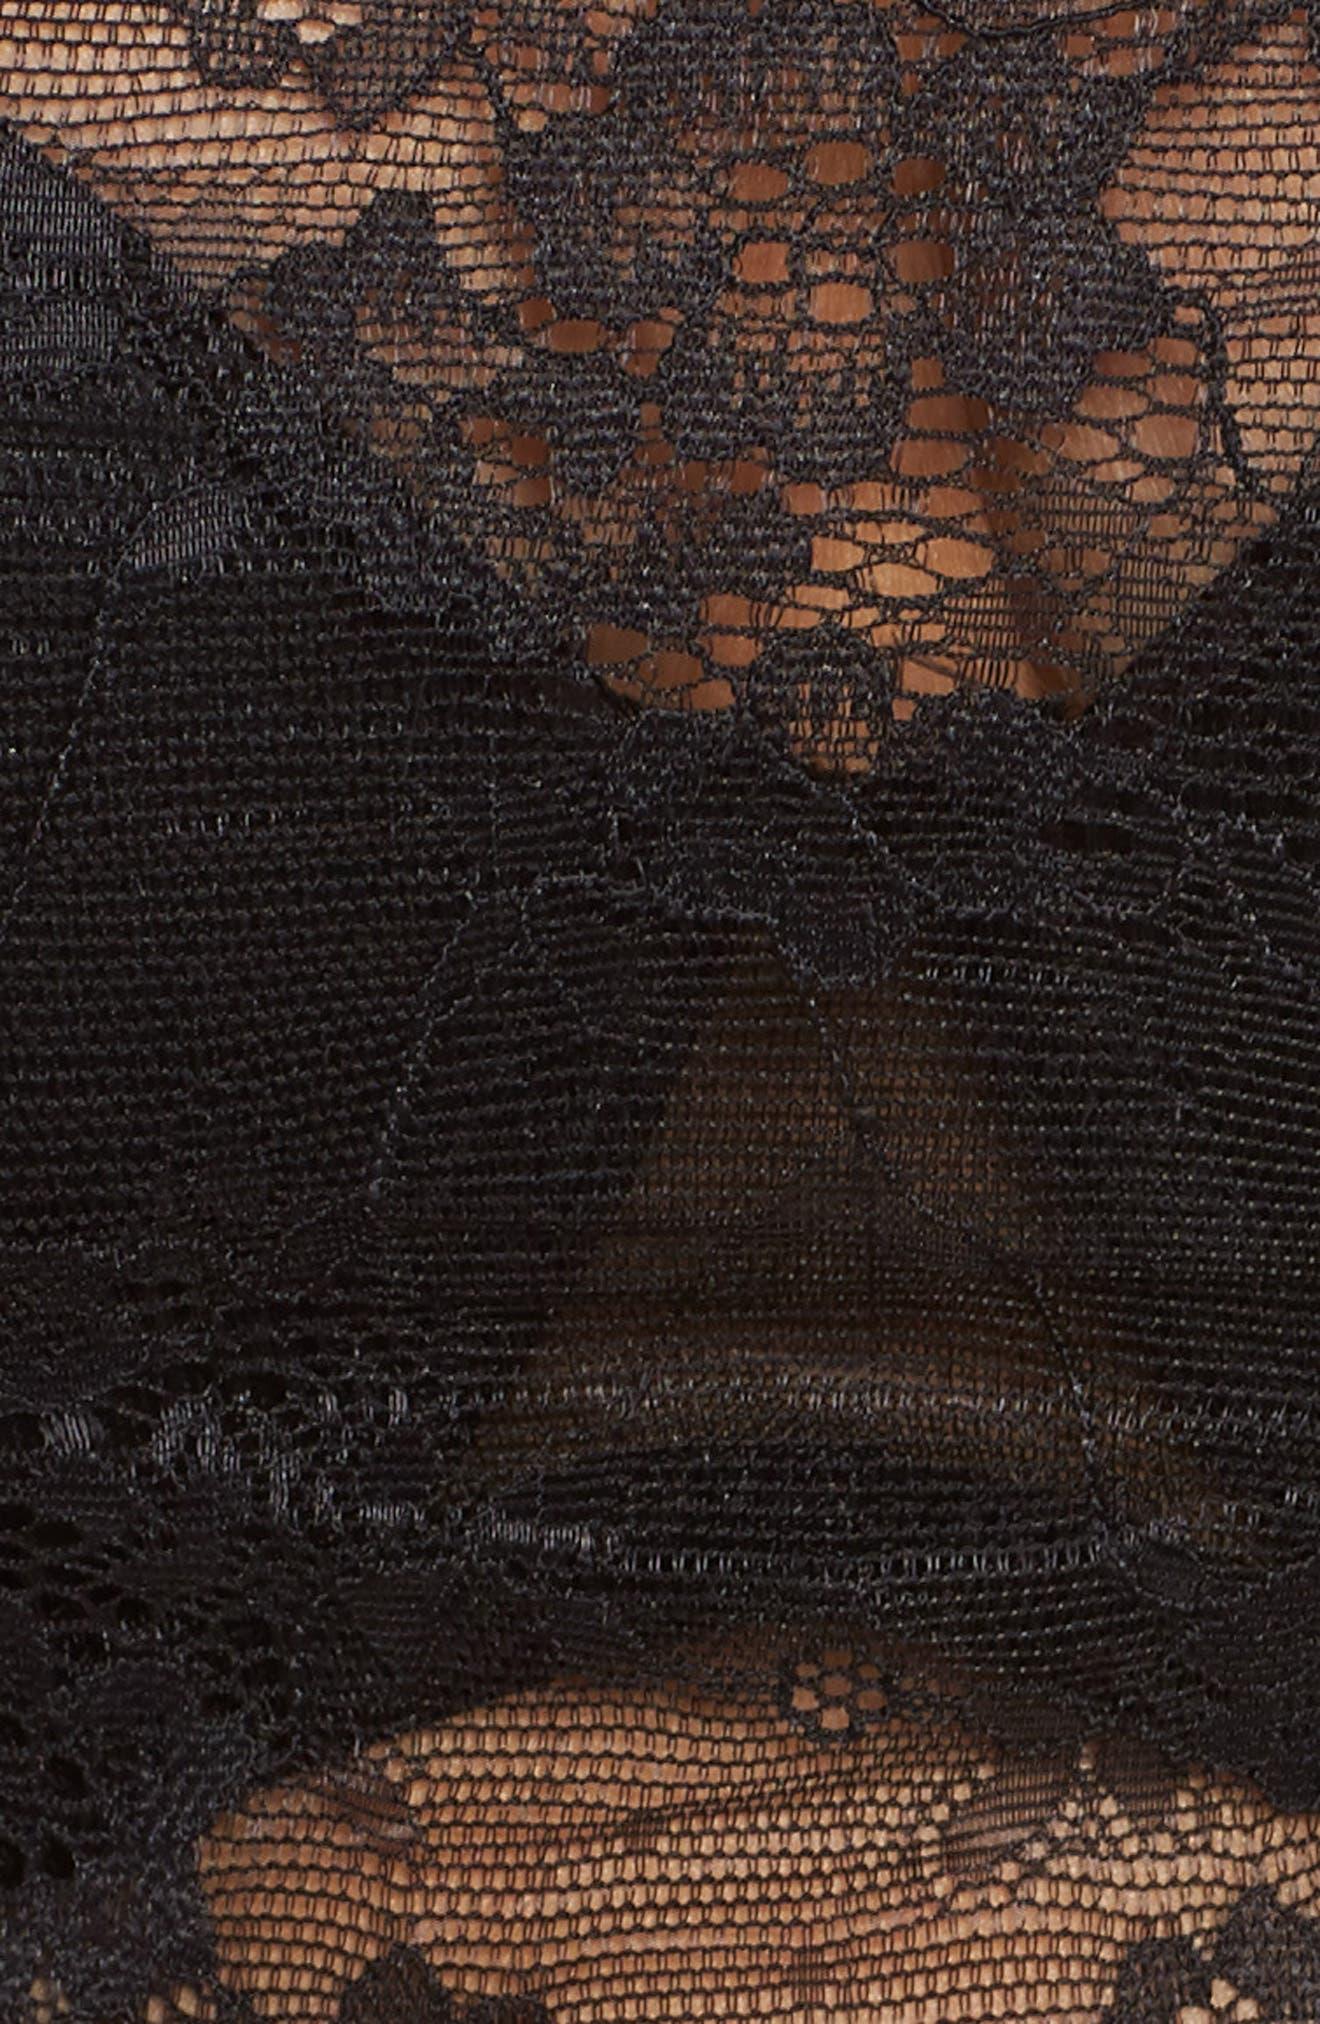 NORDSTROM LINGERIE,                             Backless Strapless Underwire Bandeau Bra,                             Alternate thumbnail 6, color,                             BLACK